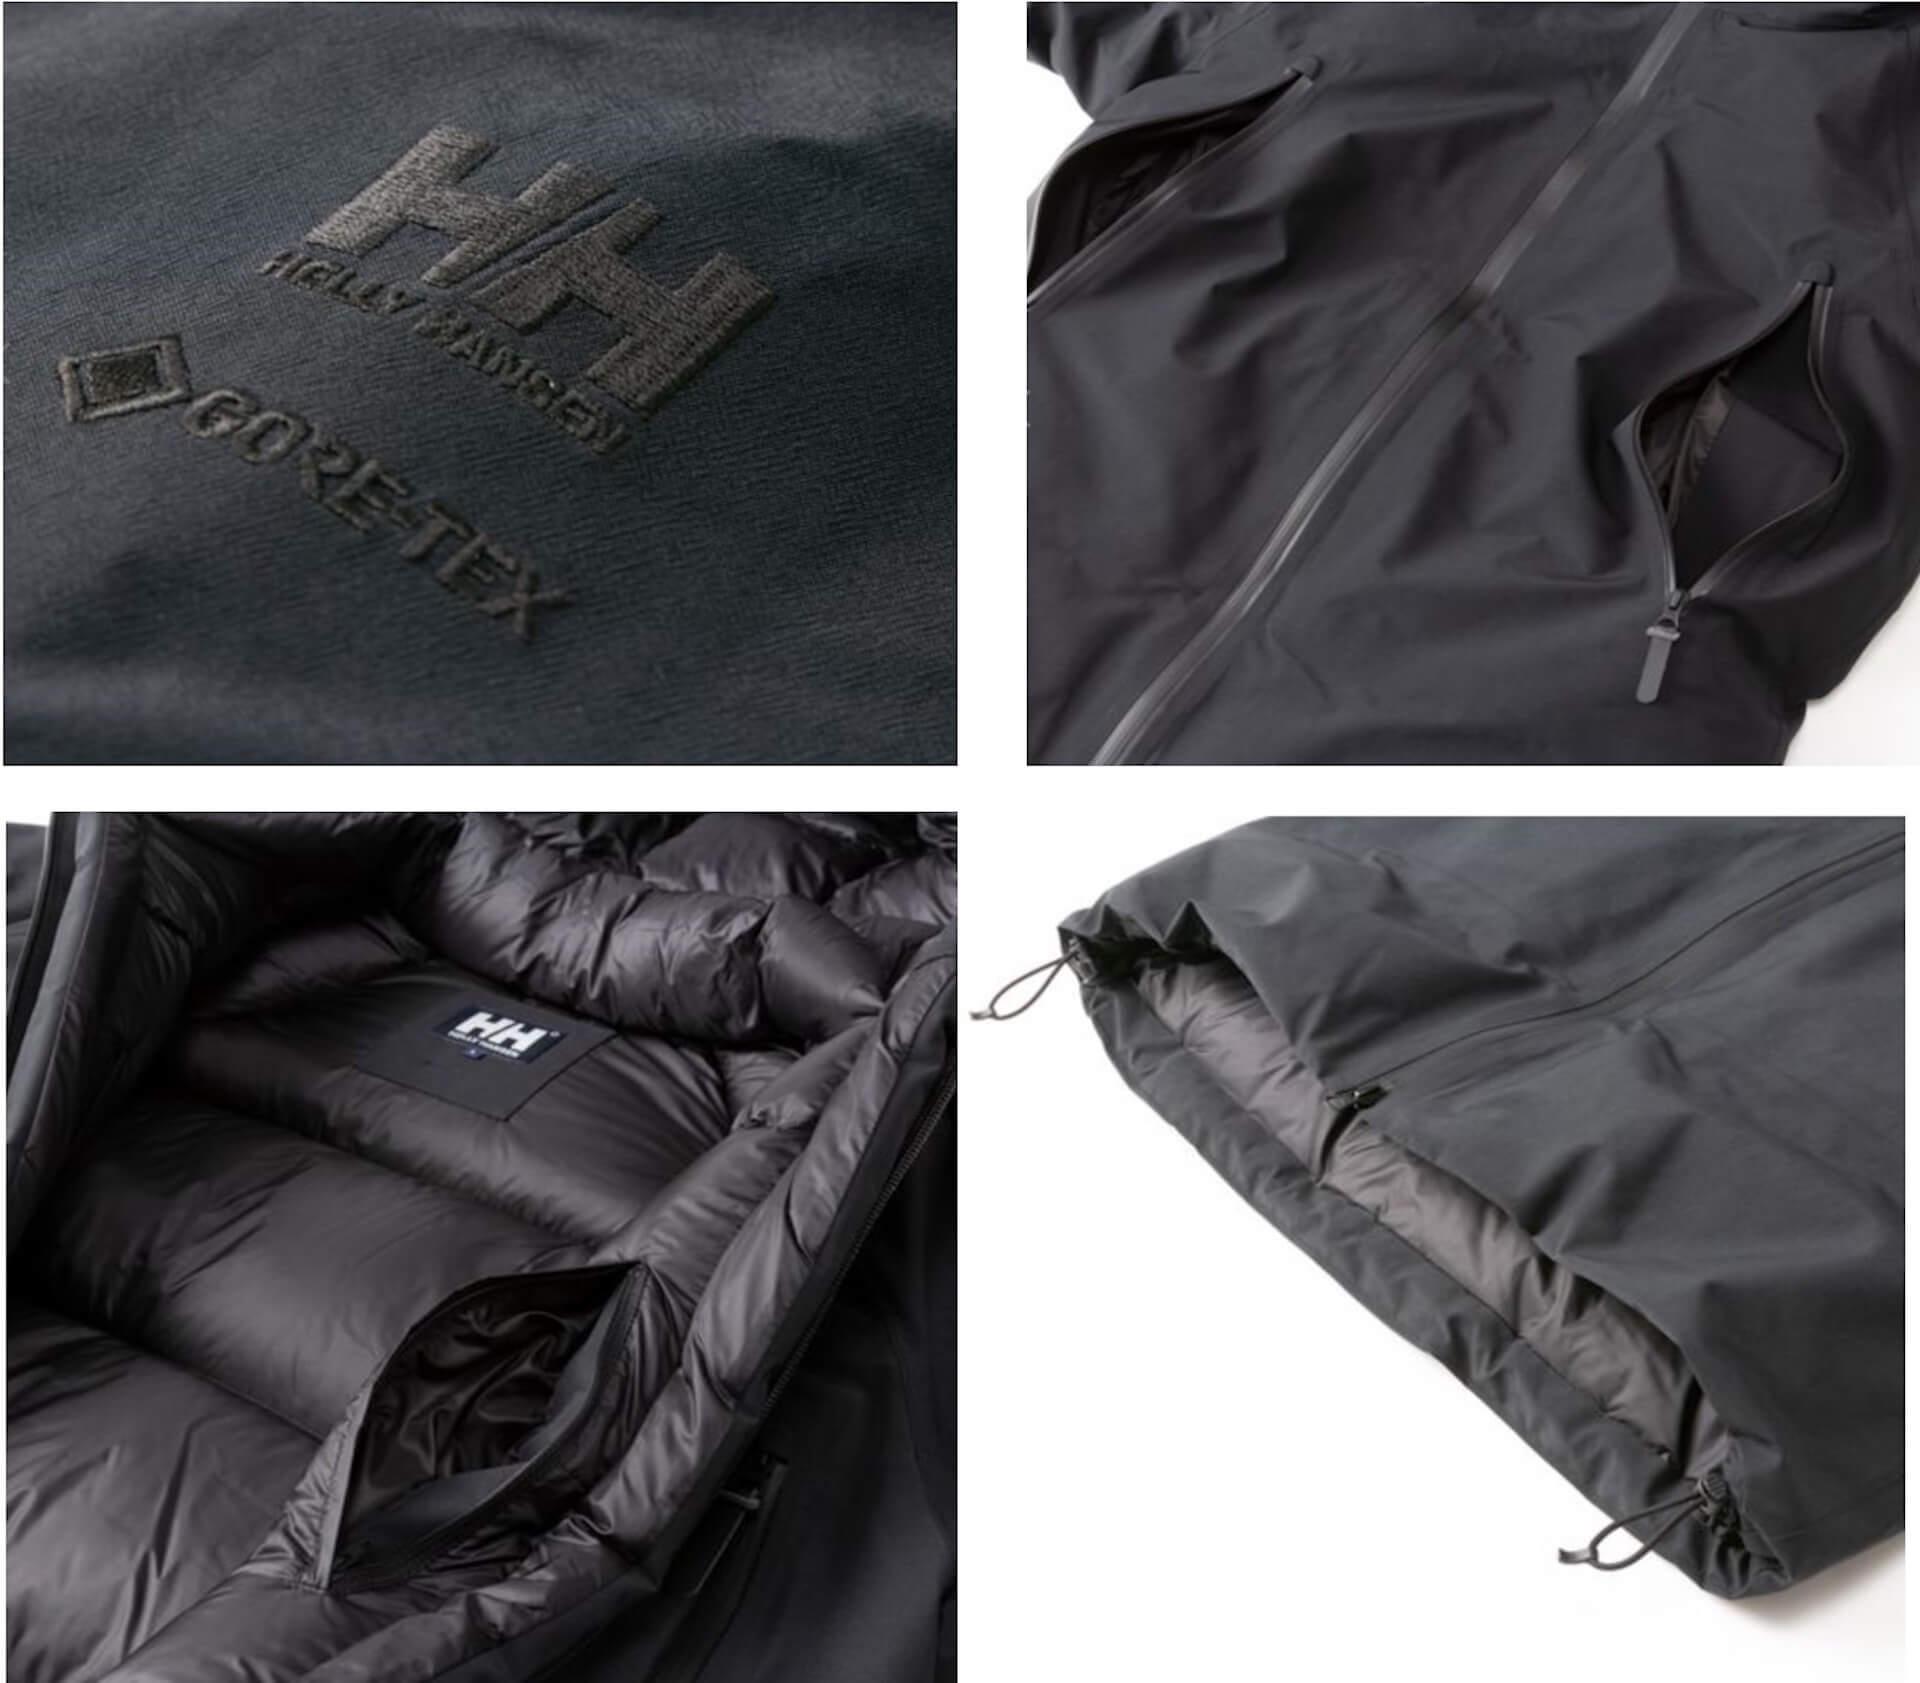 HELLY HANSENから防水透湿性を兼ね備えたハイロフトダウン『Hemsedal Jacket』&『Mager Insulation Jacket』が登場! fashion201215_hellyhansen_down_3